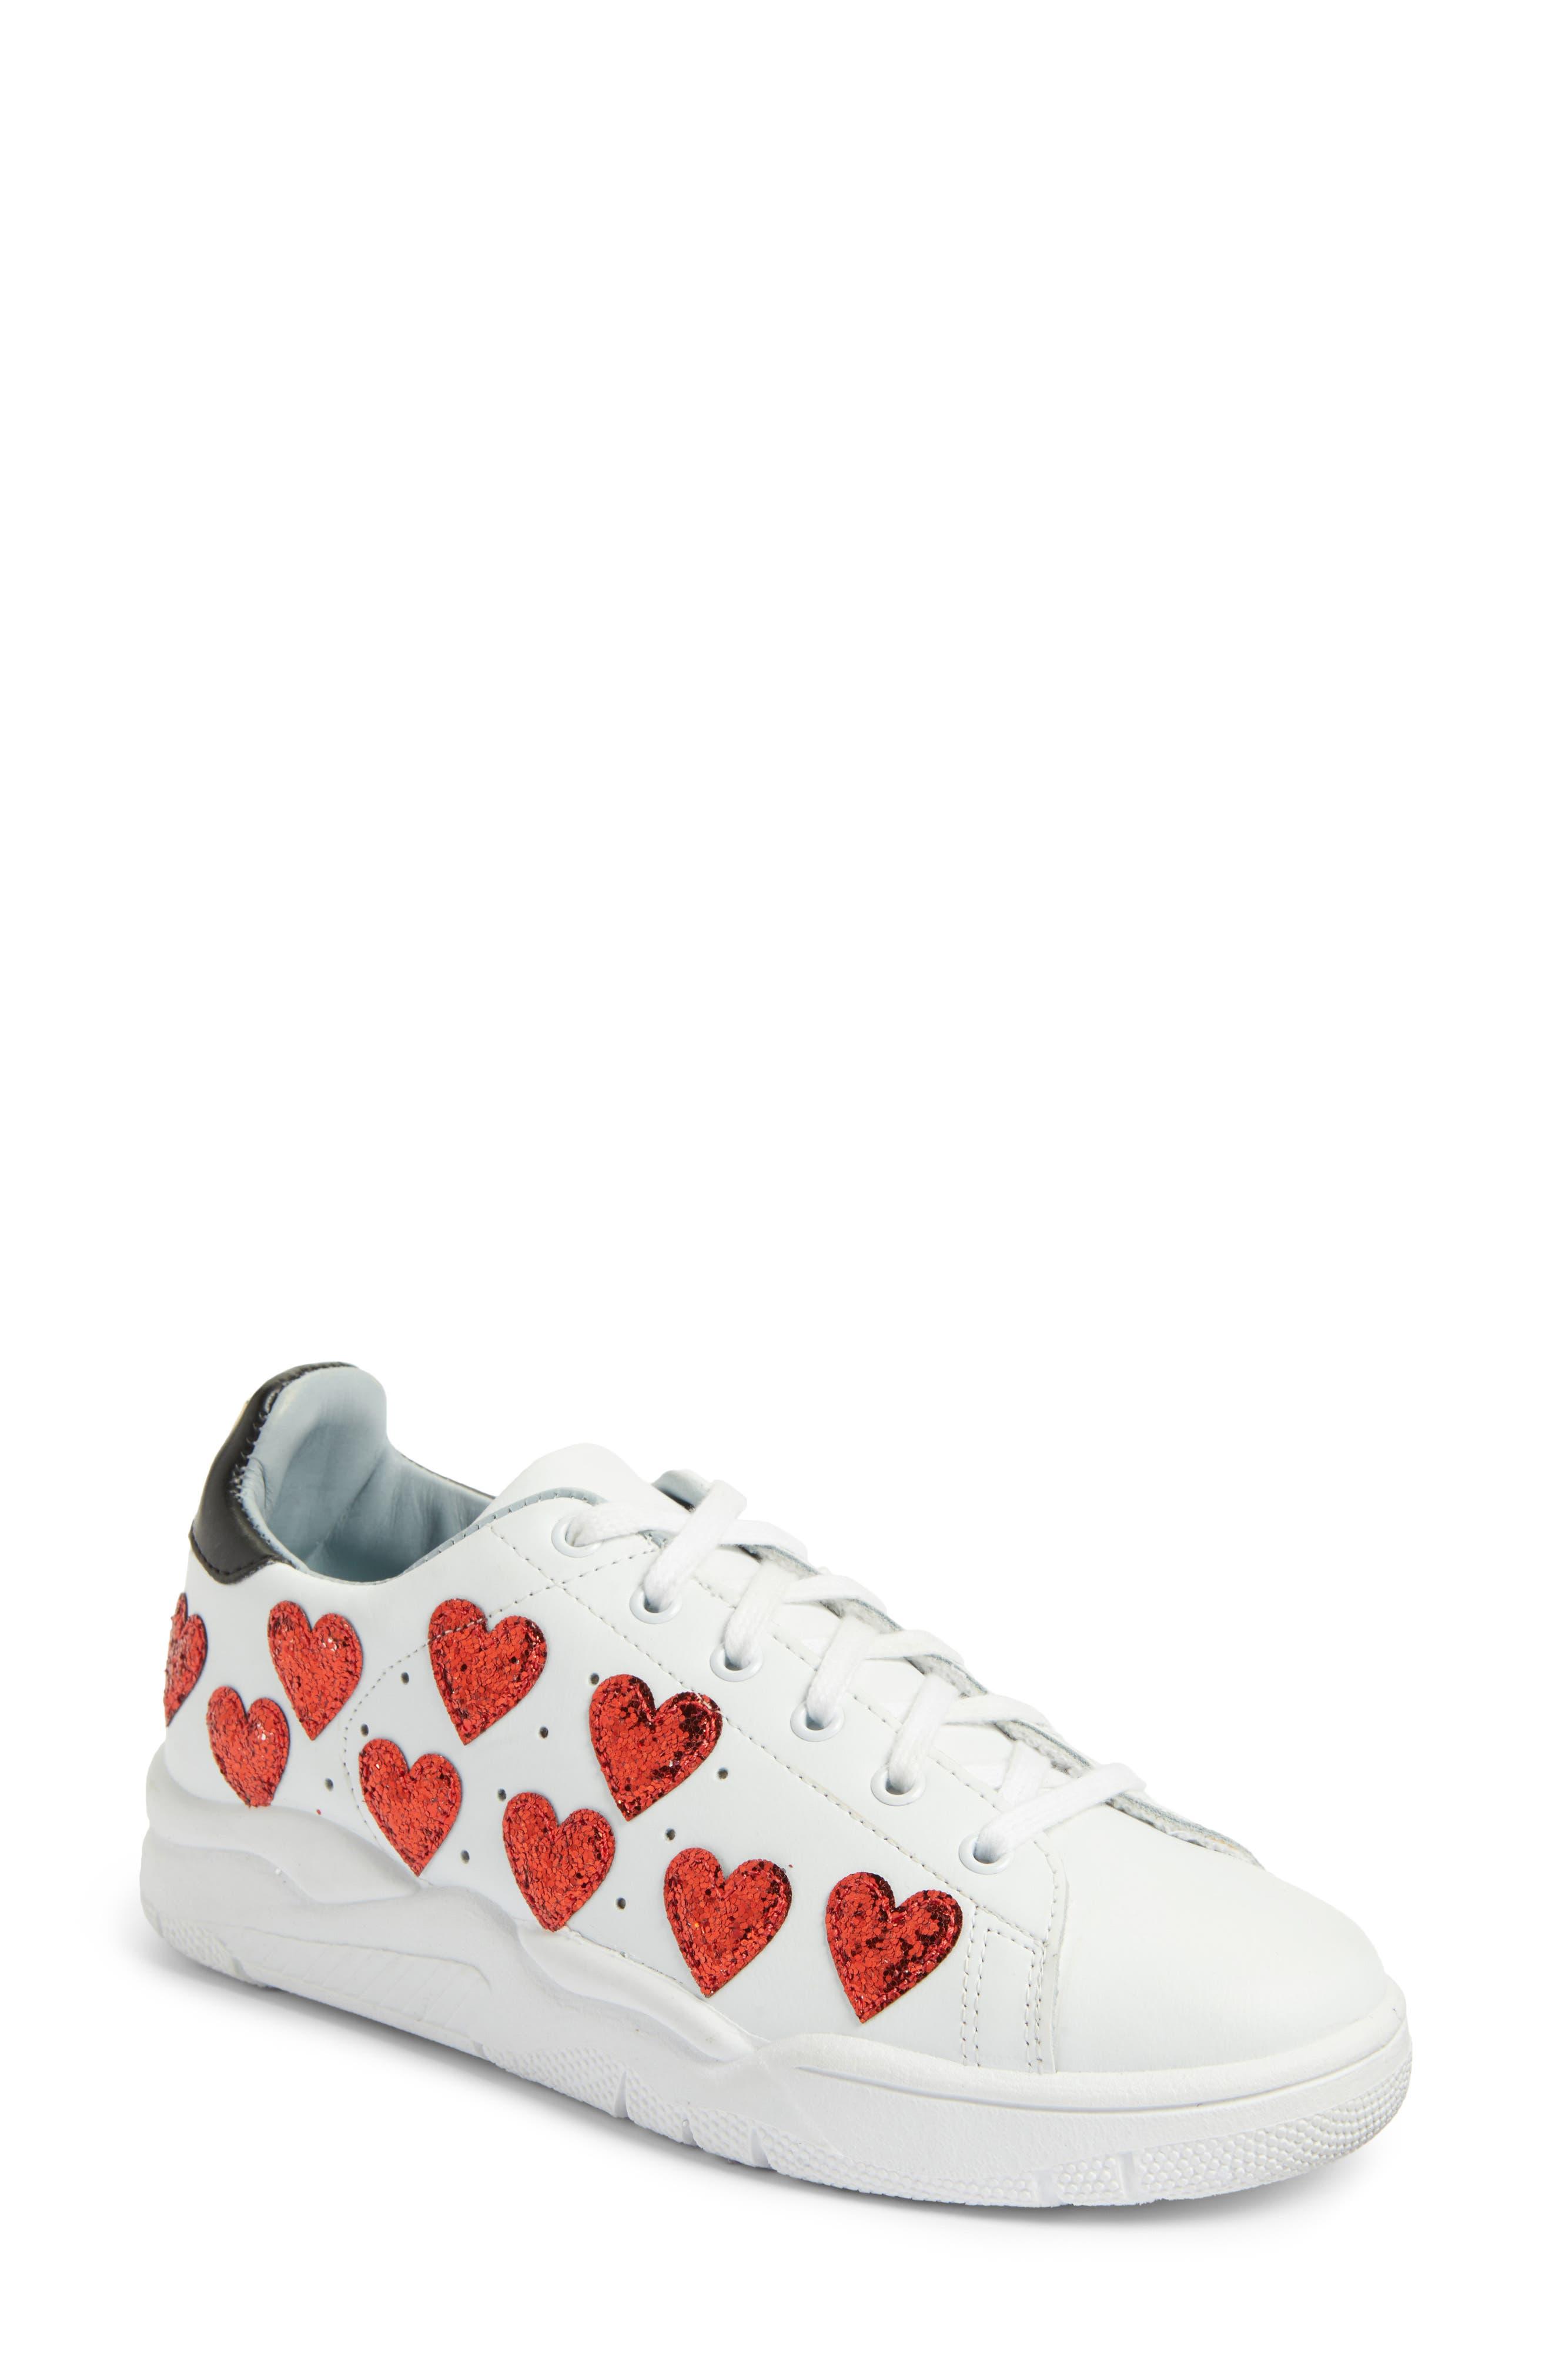 Hearts Roger Sneaker,                         Main,                         color, 102